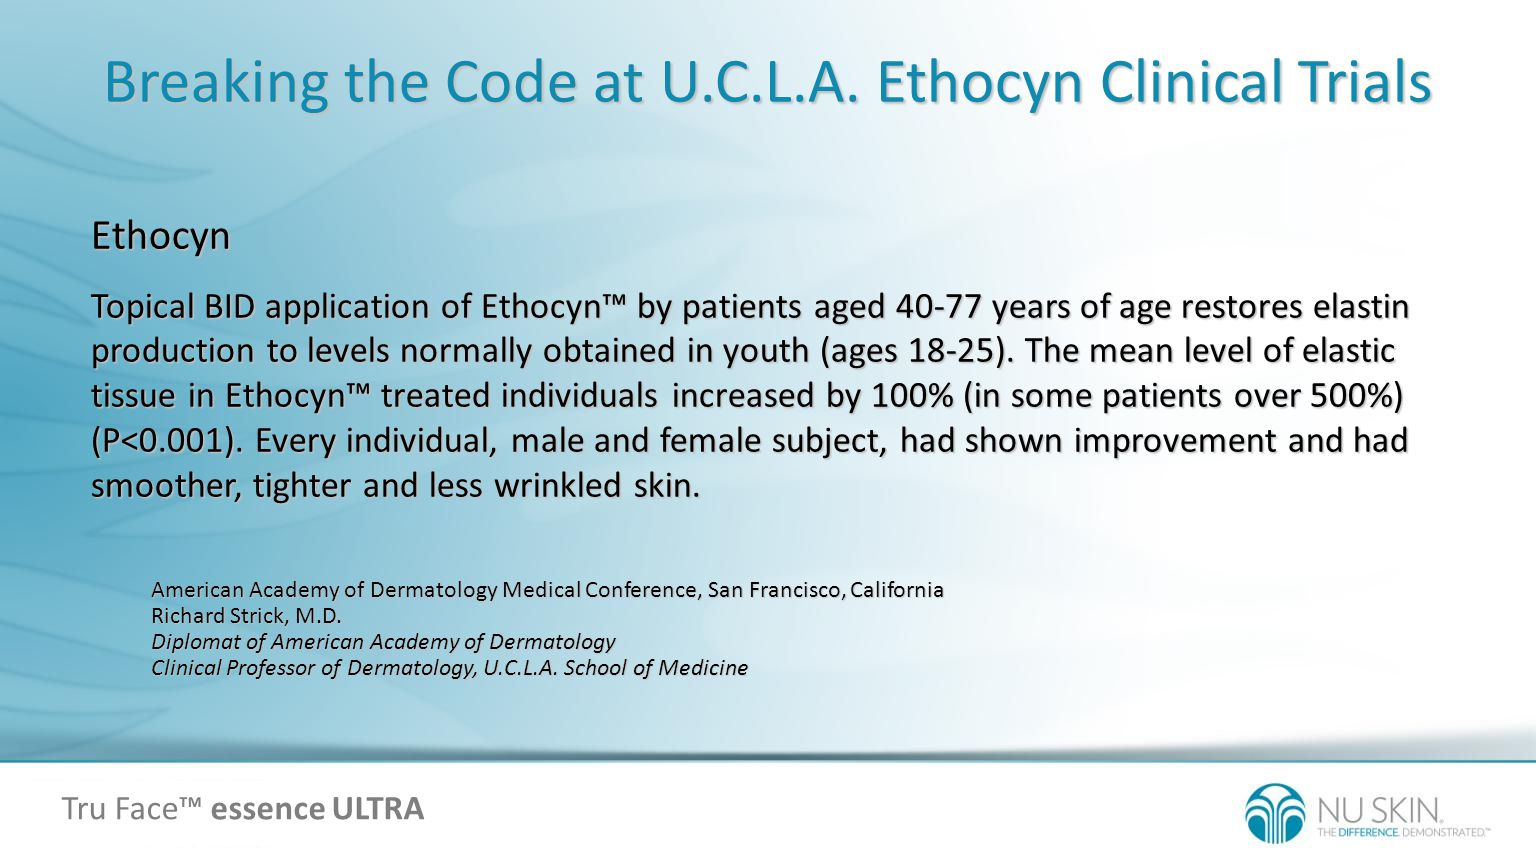 Breaking the Code at U.C.L.A. Ethocyn Clinical Trials